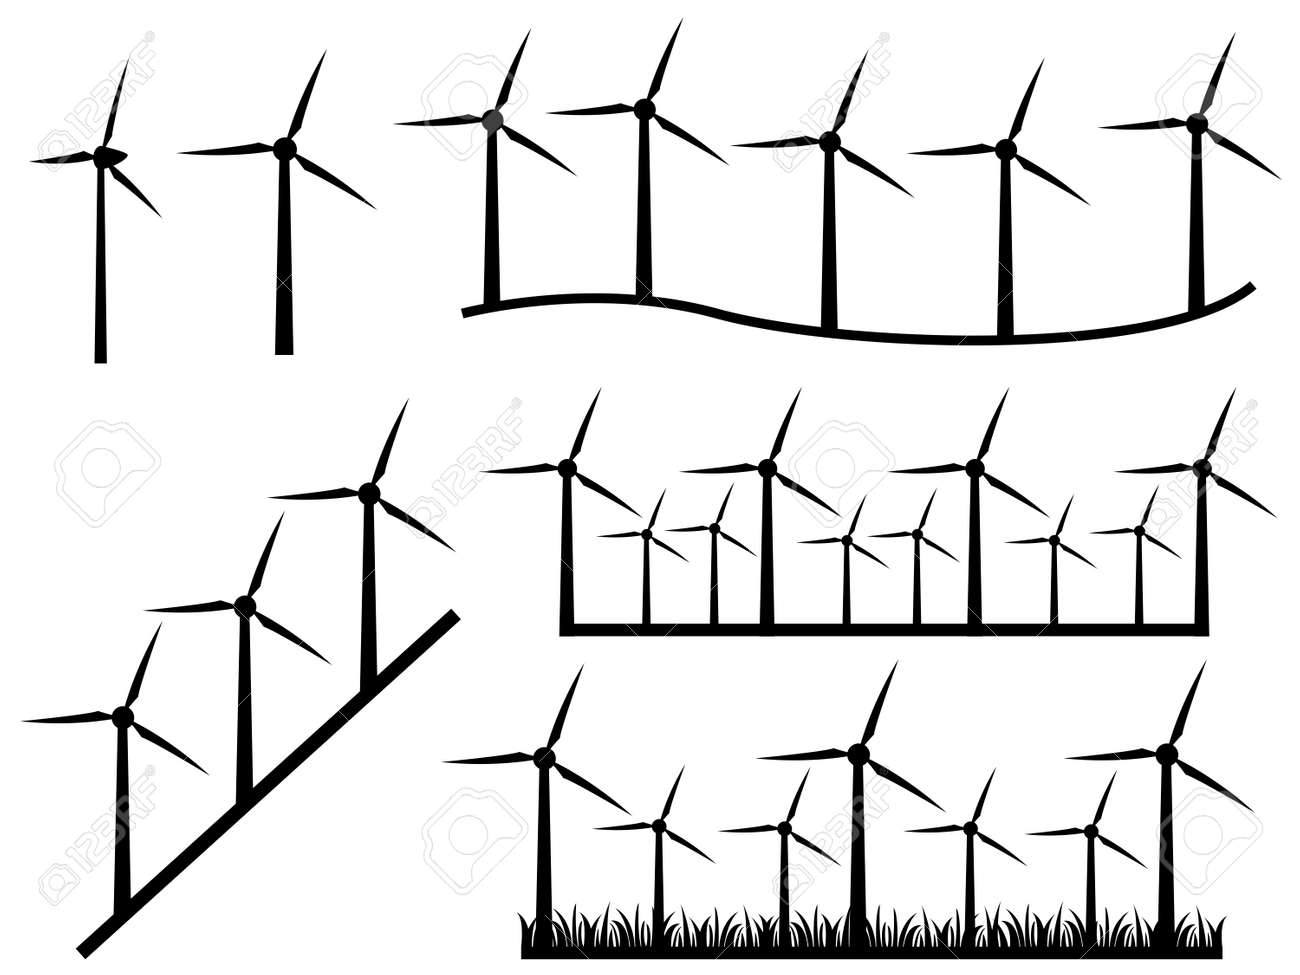 Illustration of black windmills on white background Stock Vector - 22562028